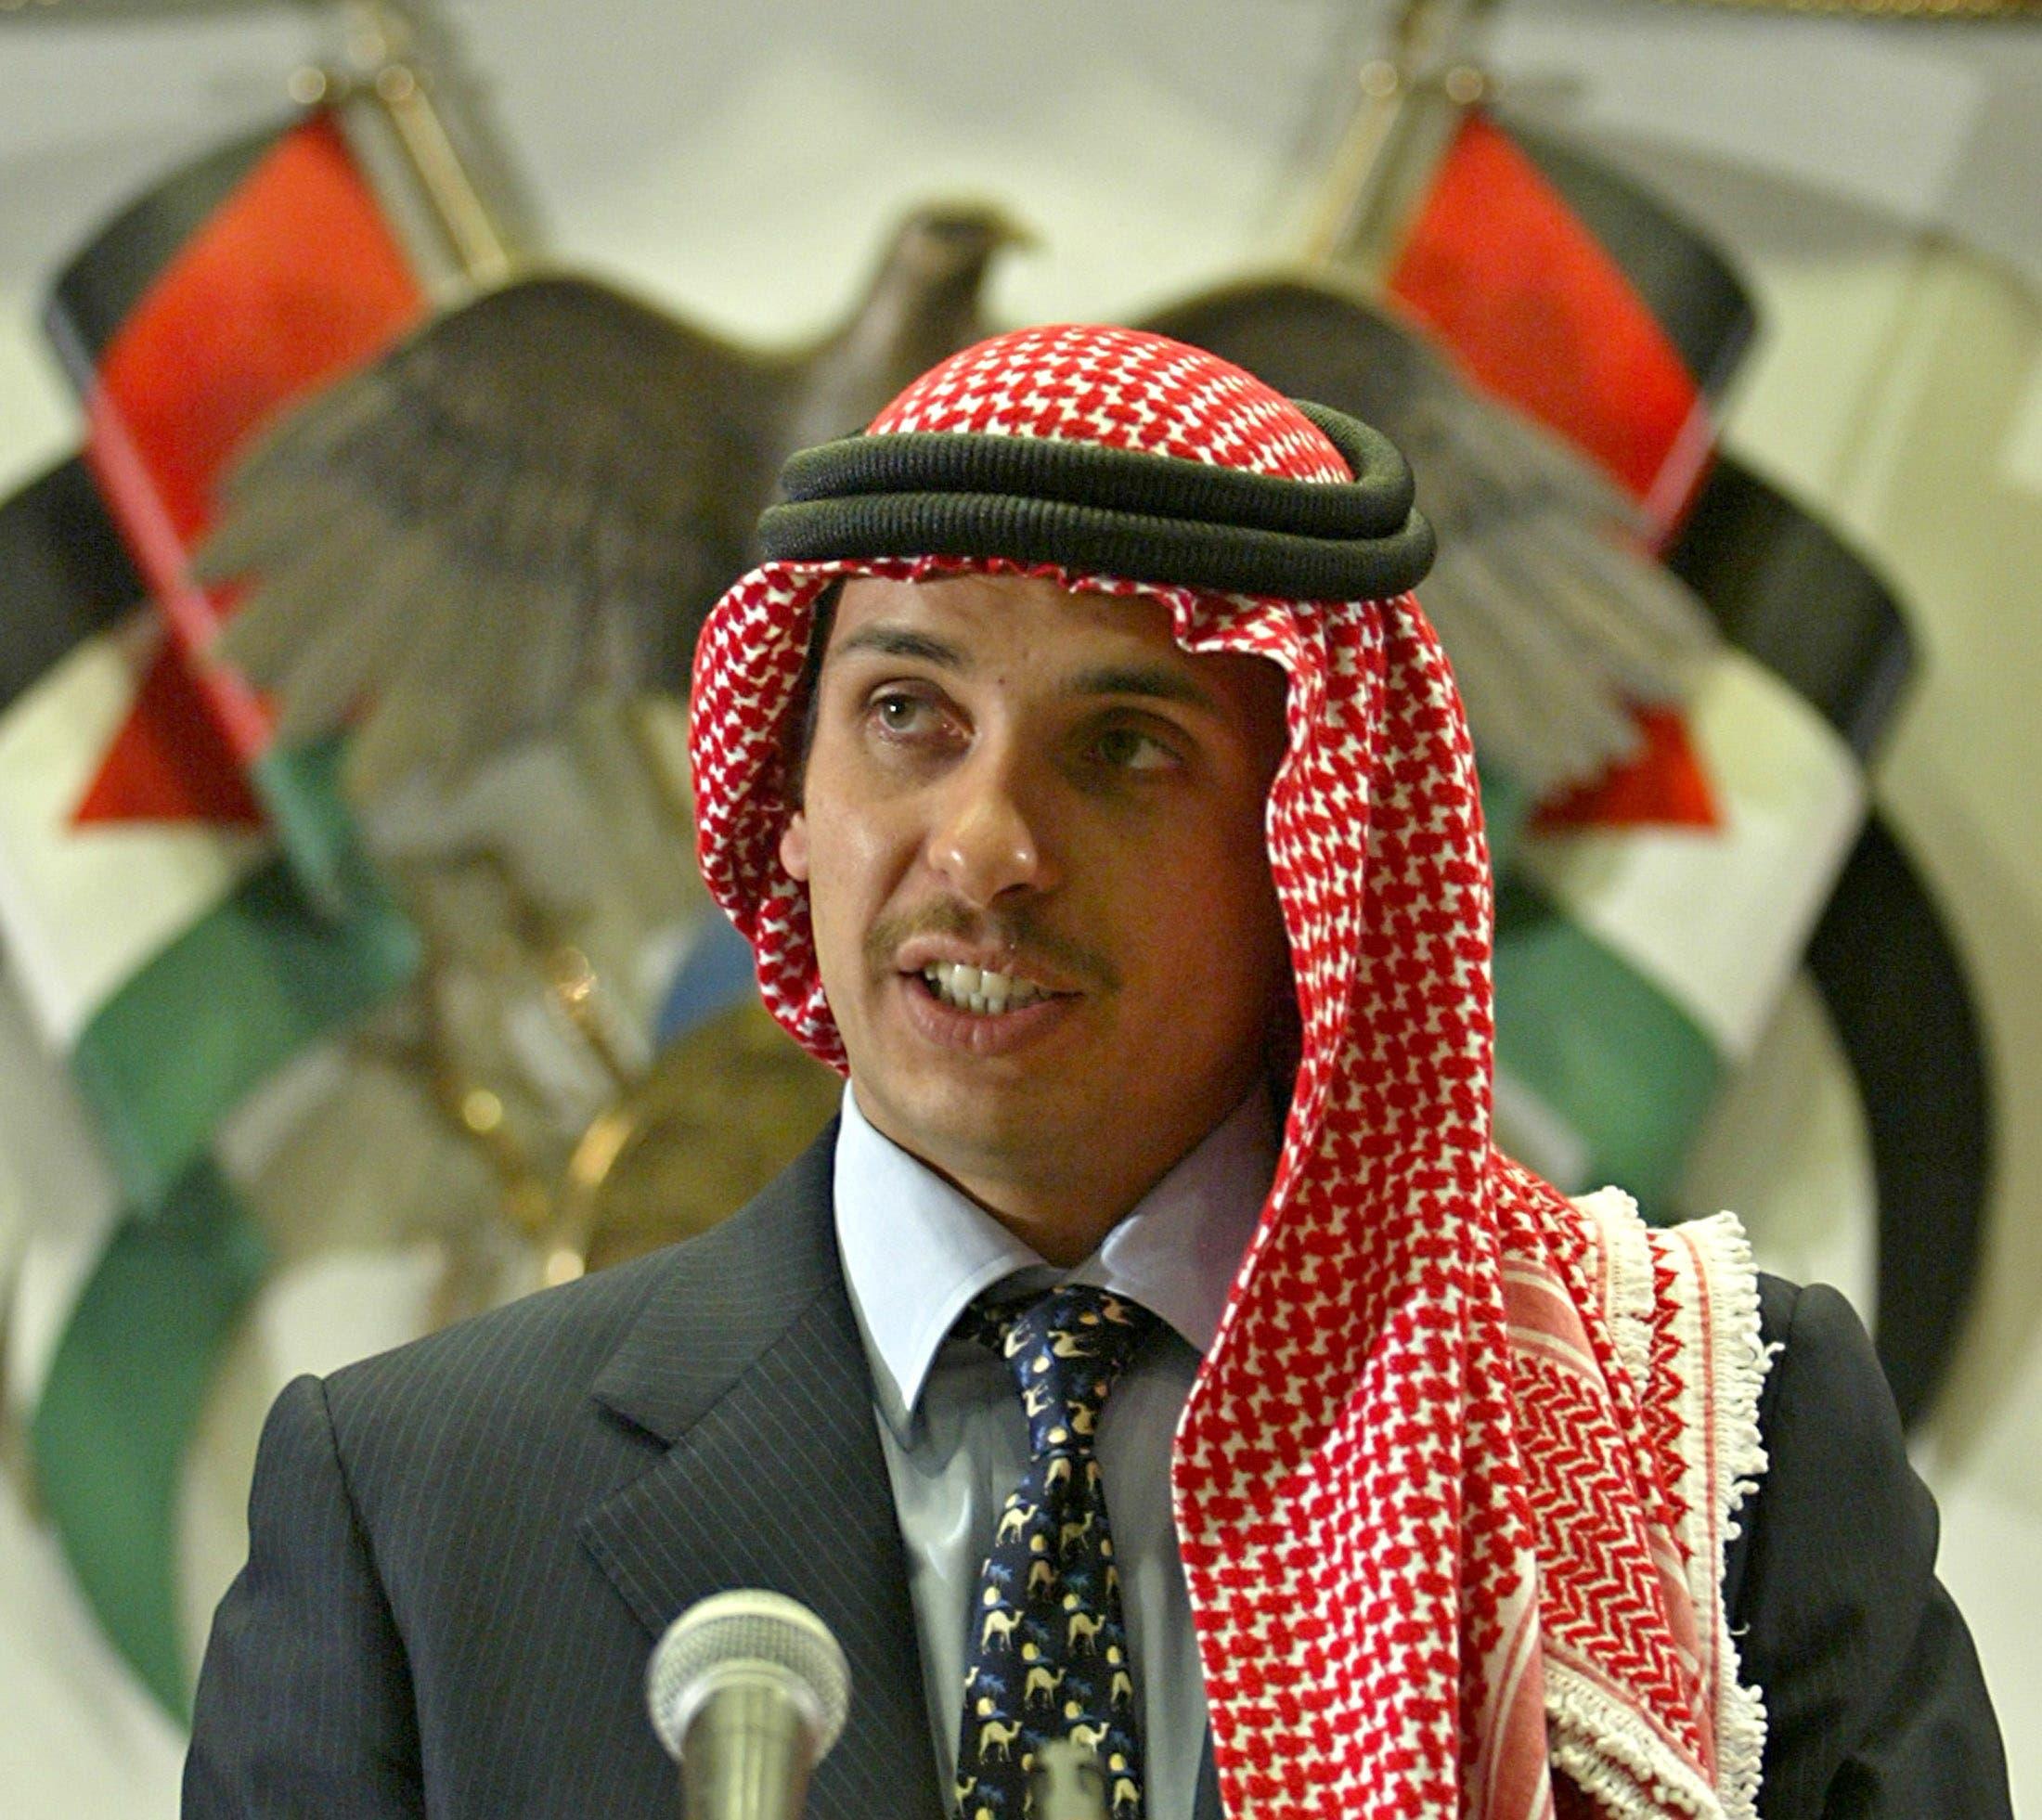 Former Jordanian Crown Prince Hamza bin Hussein delivers a speech in Amman. (File photo: Reuters)